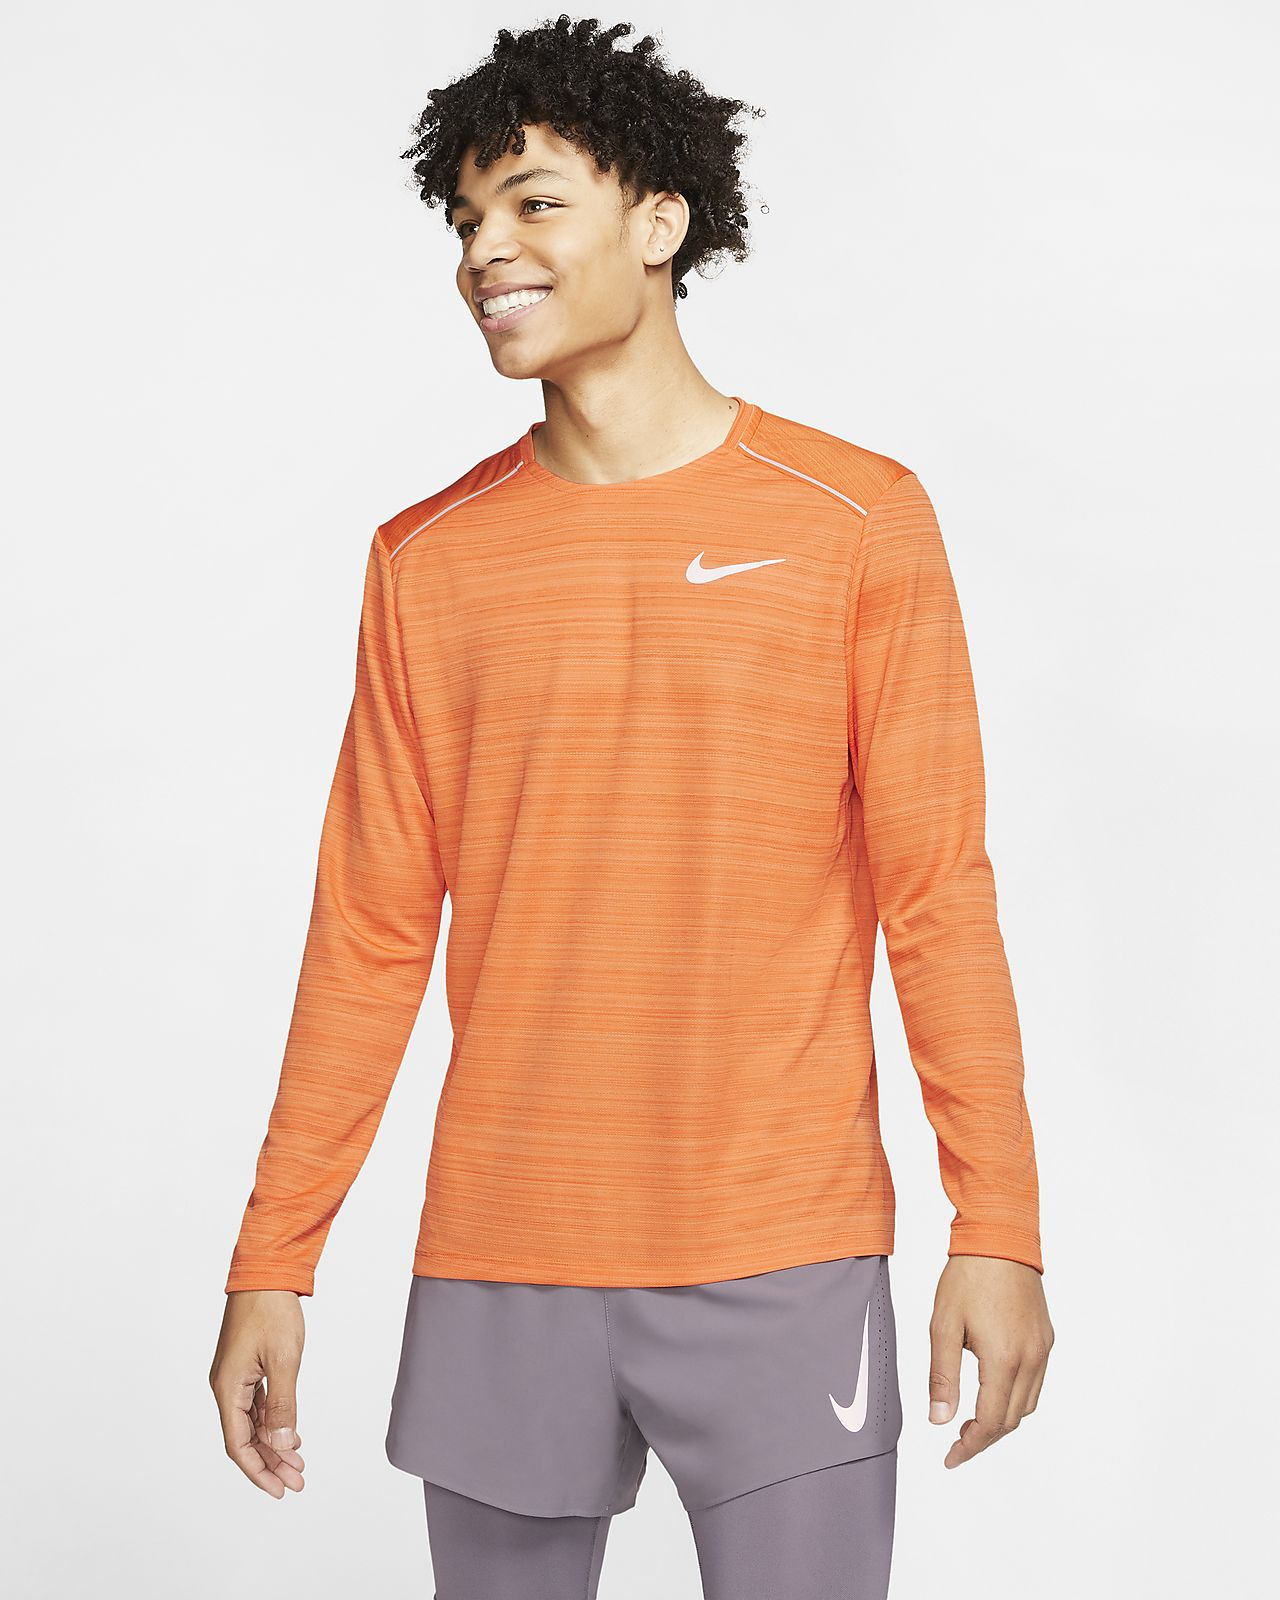 Nike Dri FIT Miler langermet løpeoverdel til herre